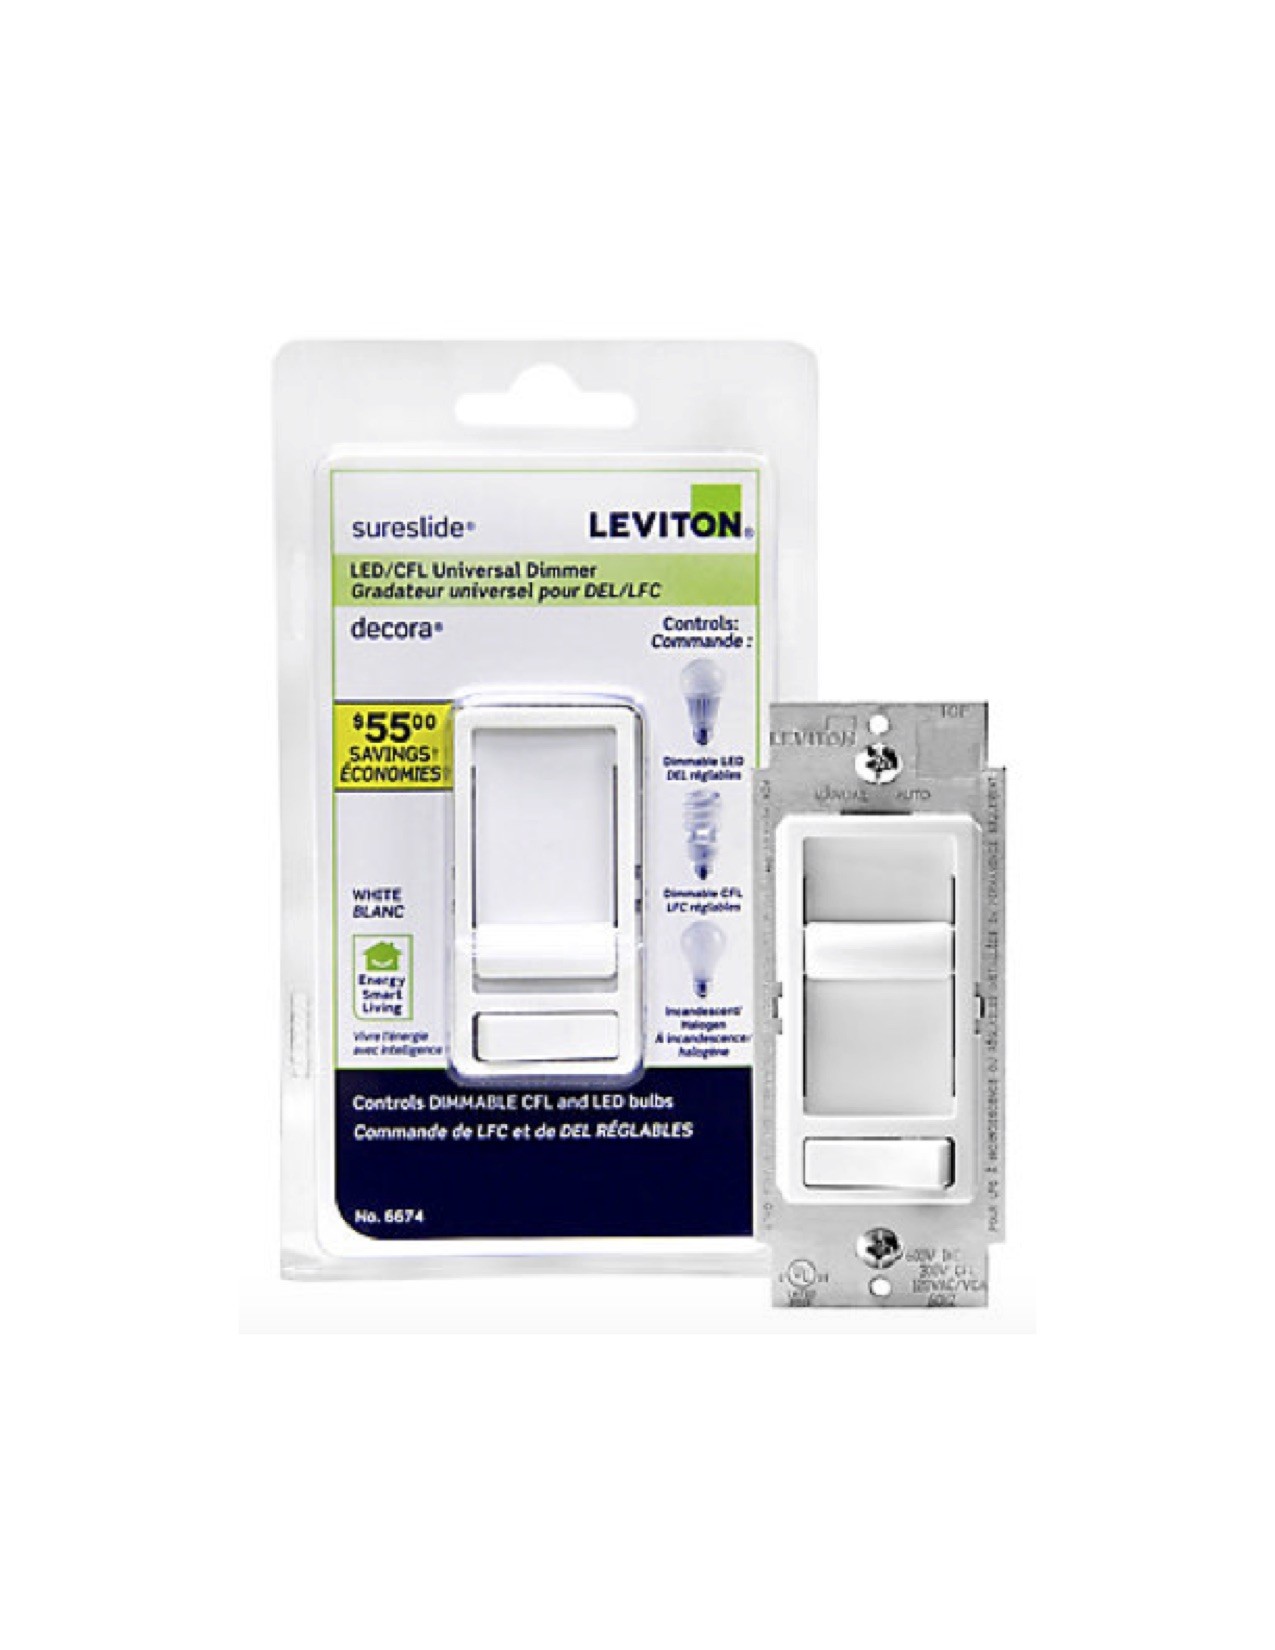 Leviton Sureslide Dimmer - 150 watt LED capacity - Lumicrest High ...